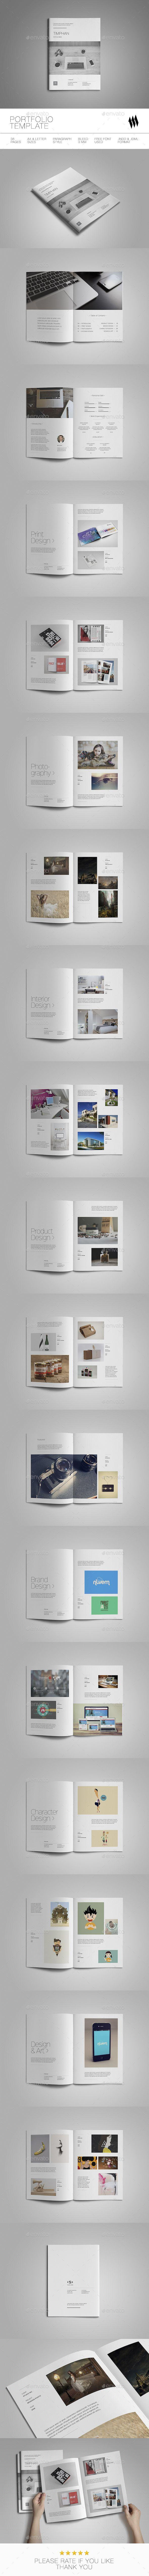 Timphan Portfolio Brochure Template InDesign INDD. Download here: http://graphicriver.net/item/timphan-portfolio/16316989?ref=ksioks